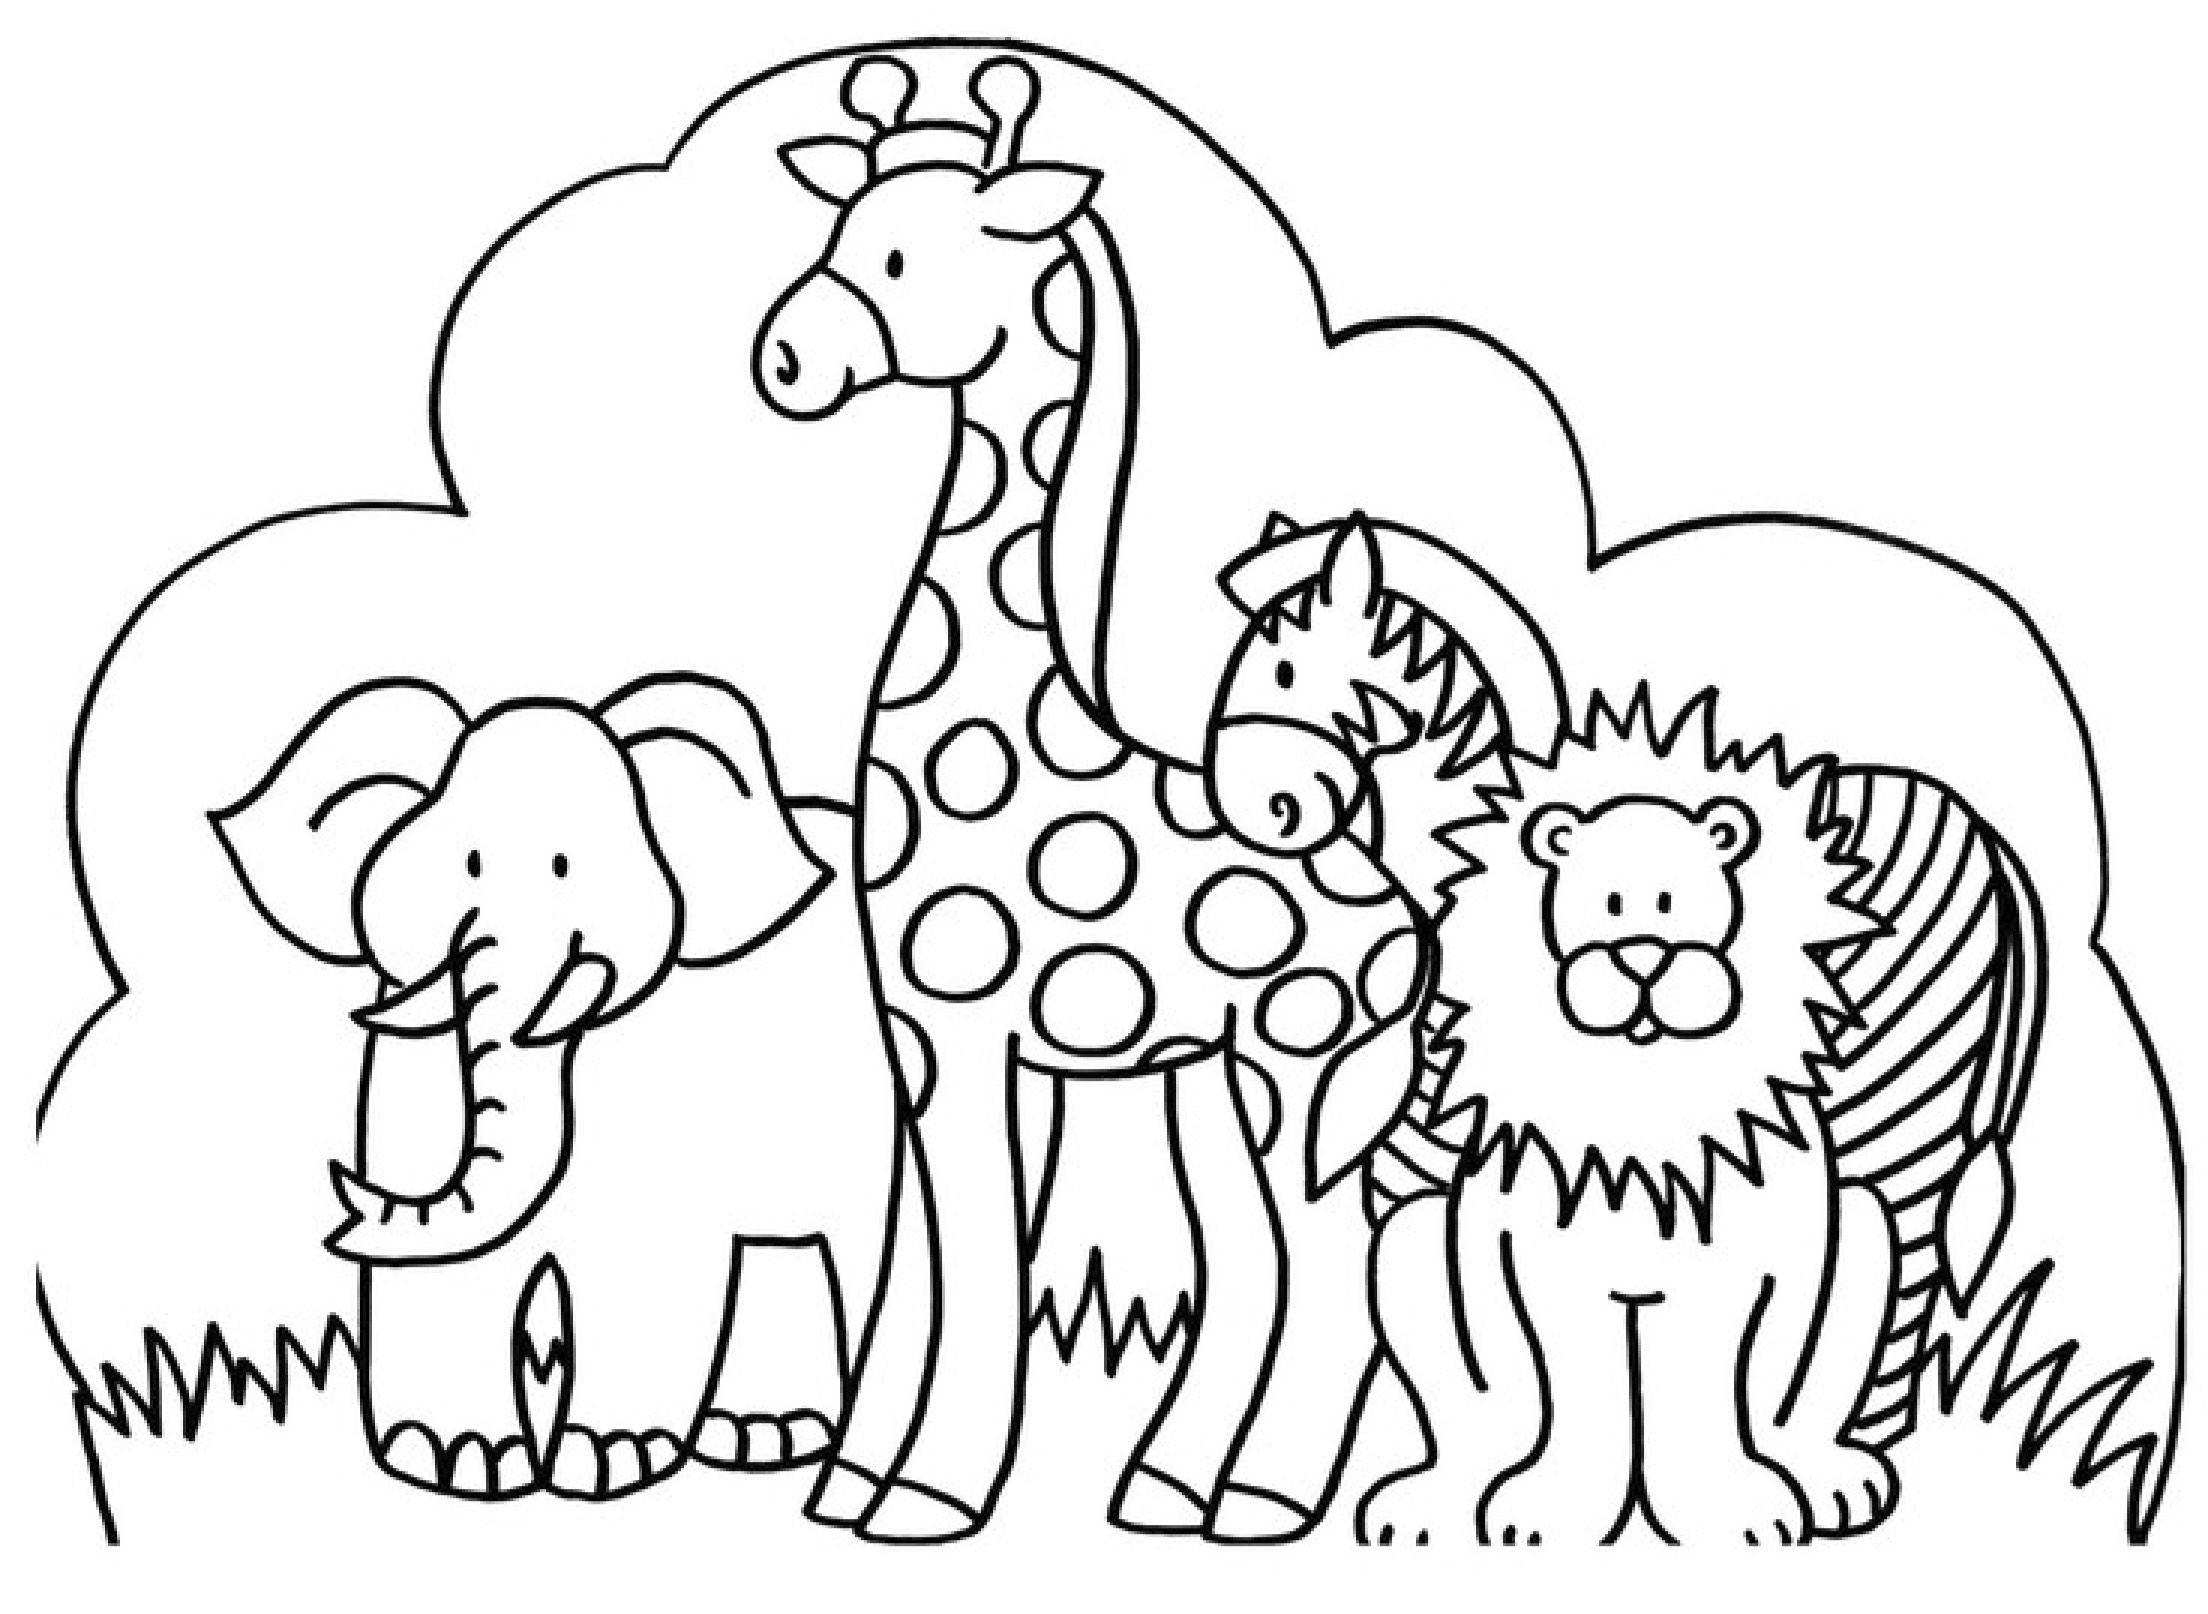 Ausmalbilder Tiere #ausmalbilder #tiere   Ausmalbilder Tiere bei Tierbilder Zum Ausmalen Kostenlos